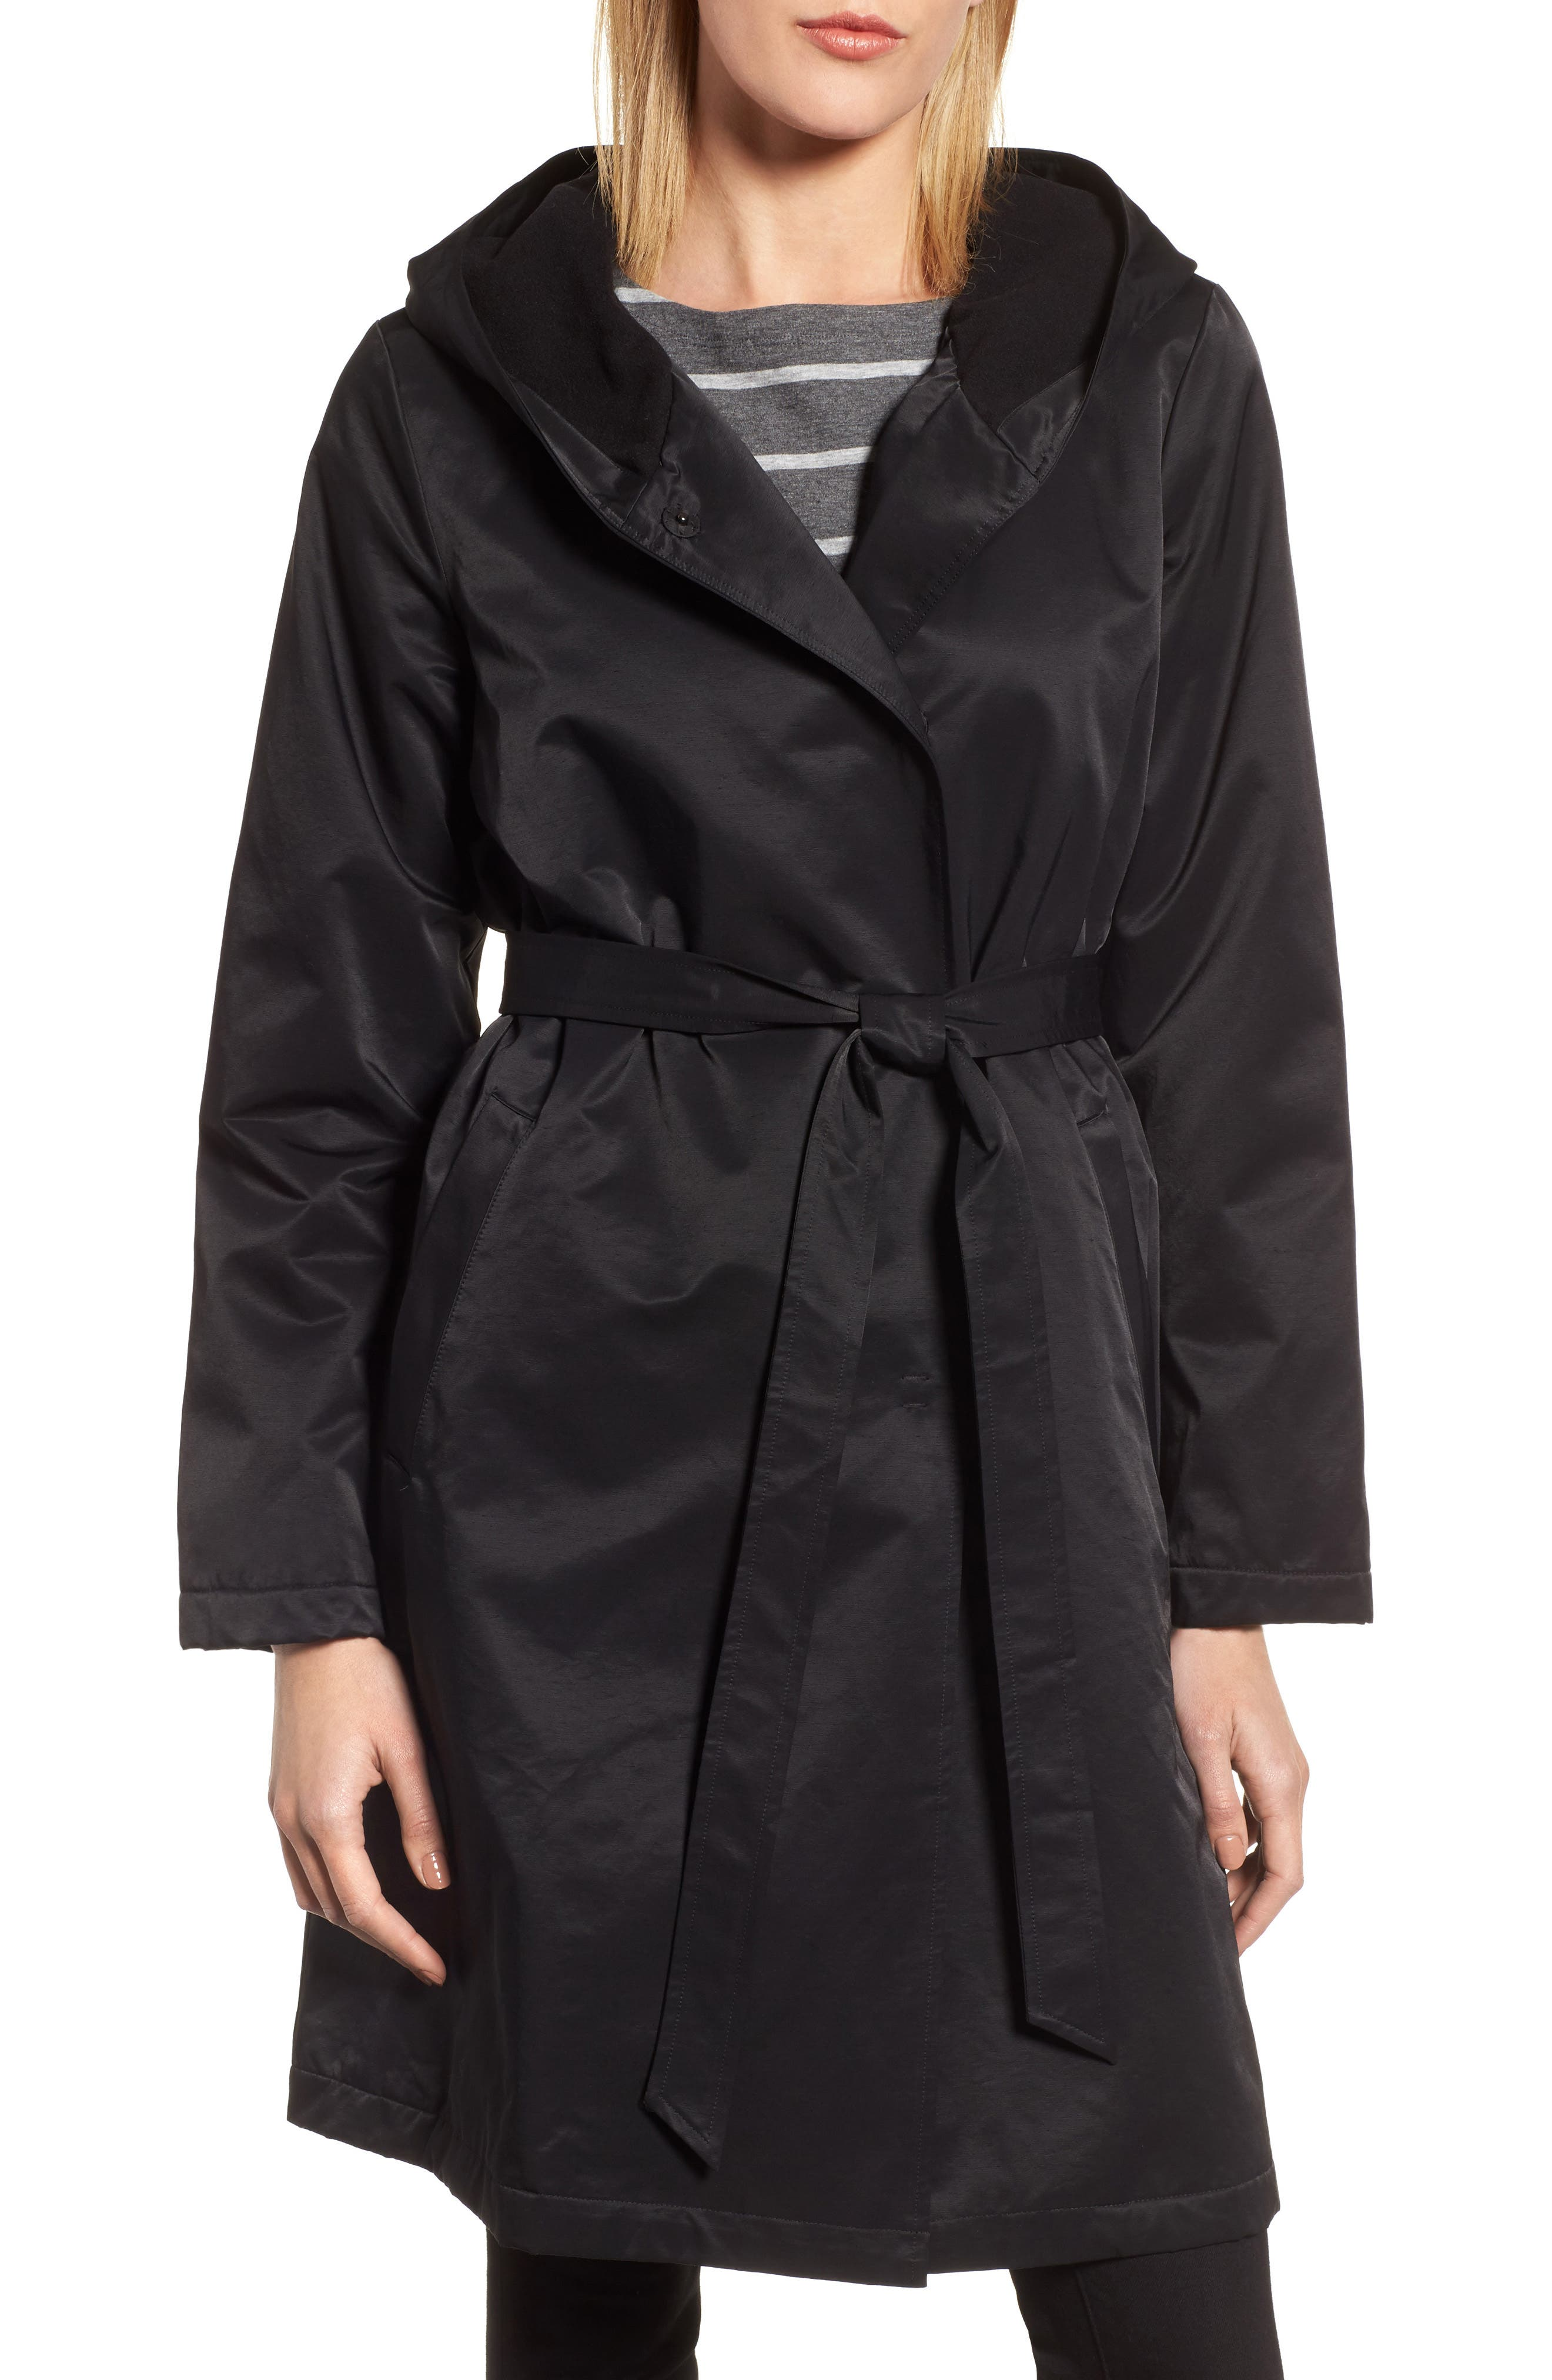 Fleece Lined Hooded Coat,                         Main,                         color, Black